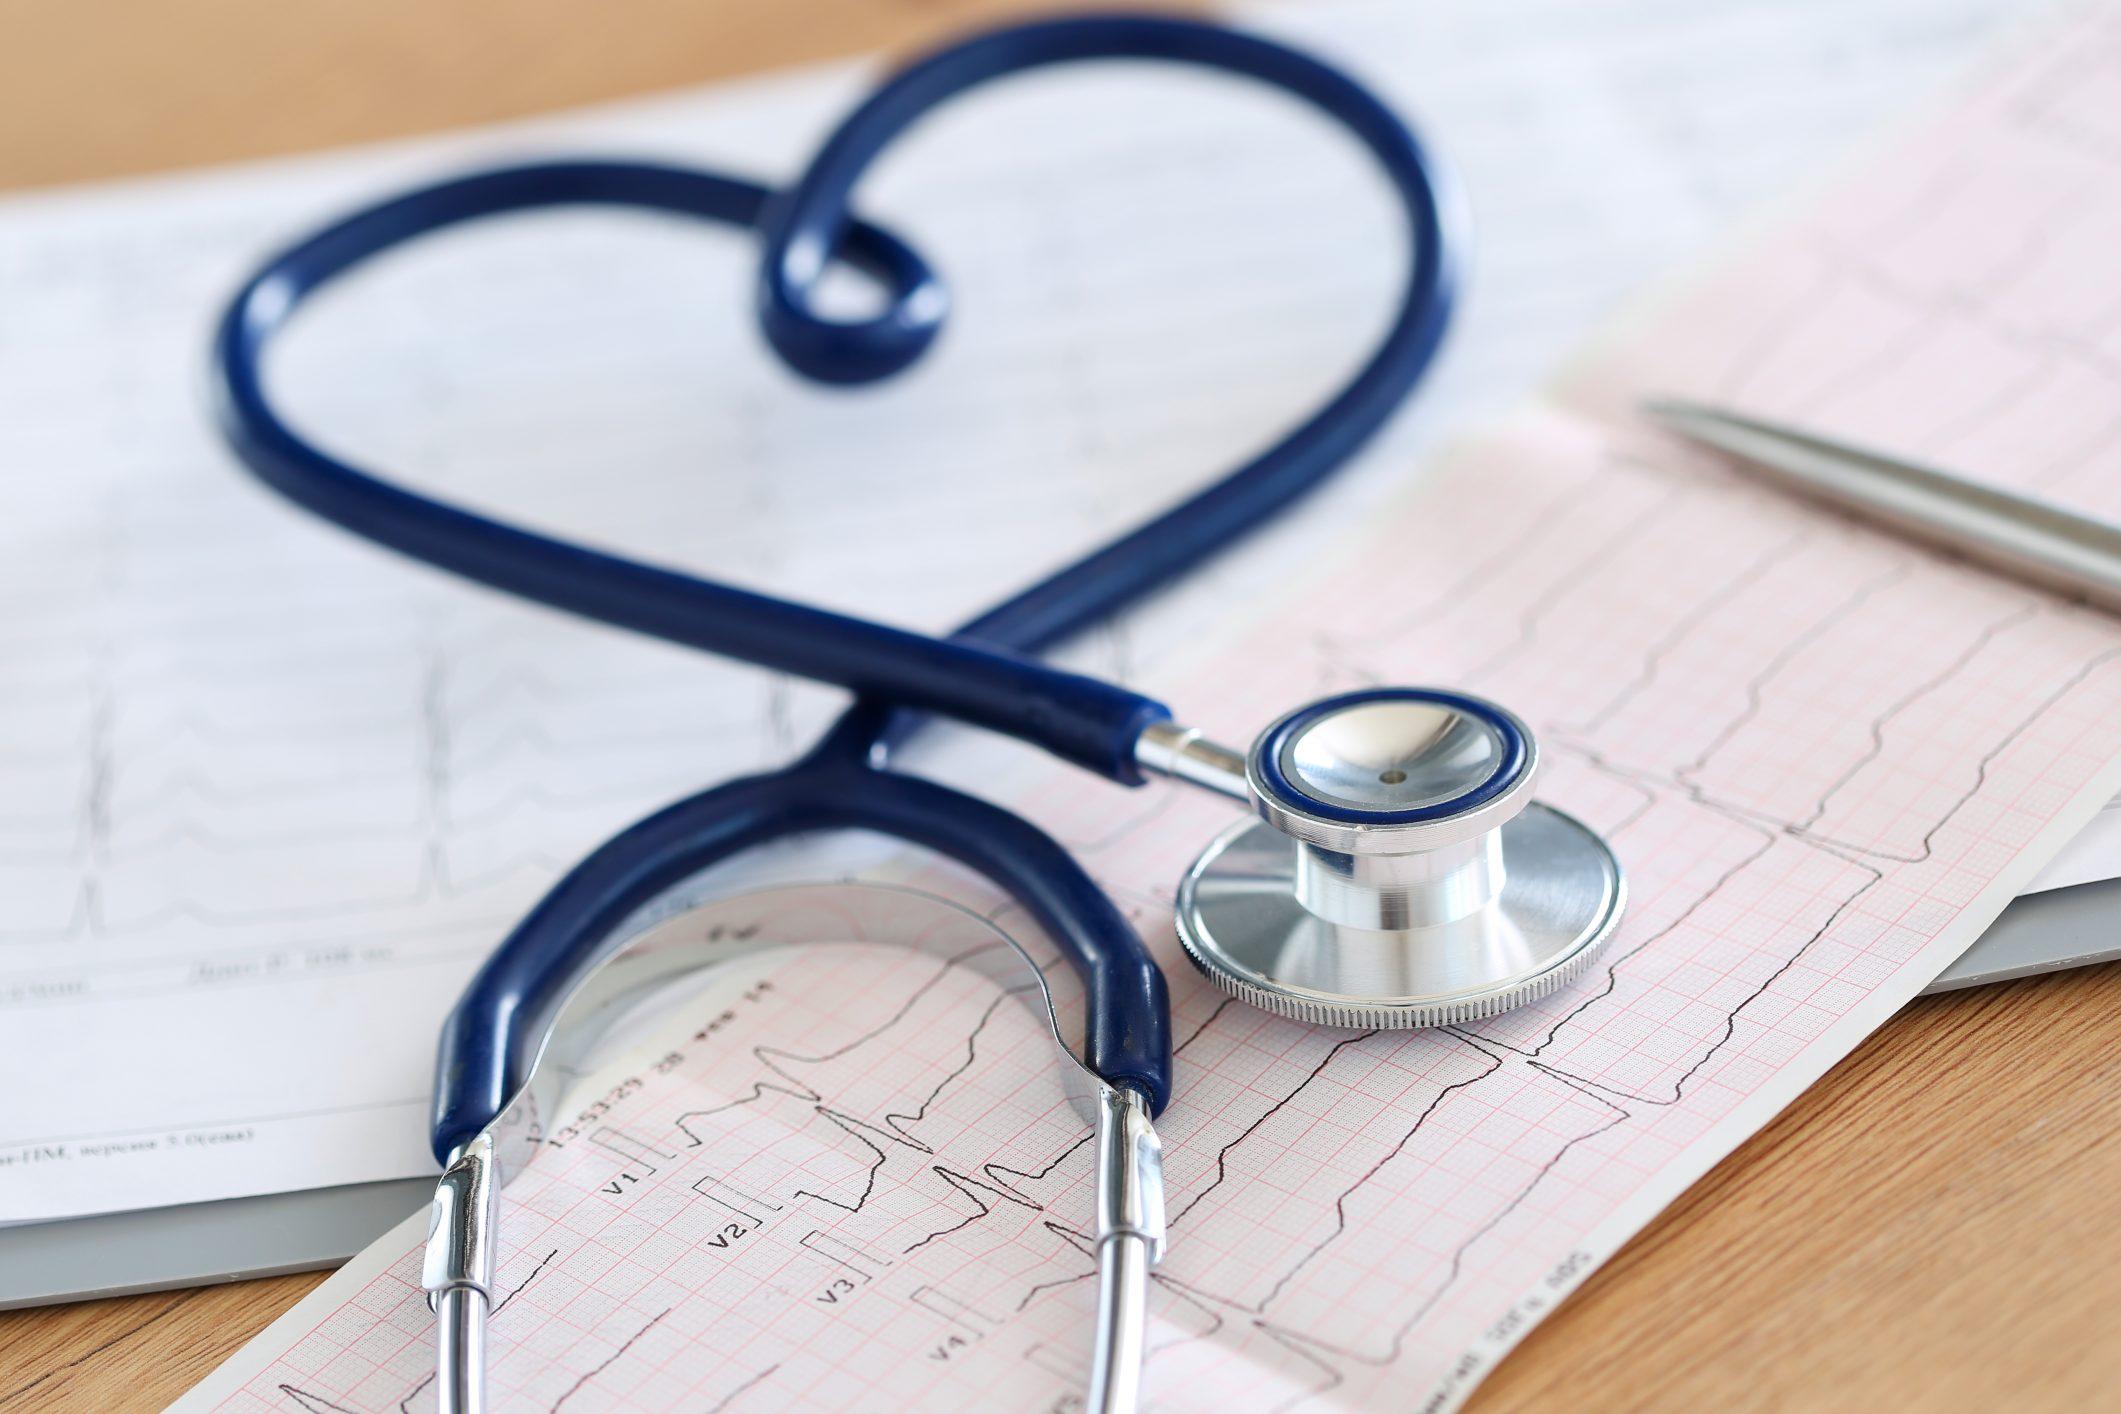 Dr. John Vyselaar, North Vancouver Cardiologist